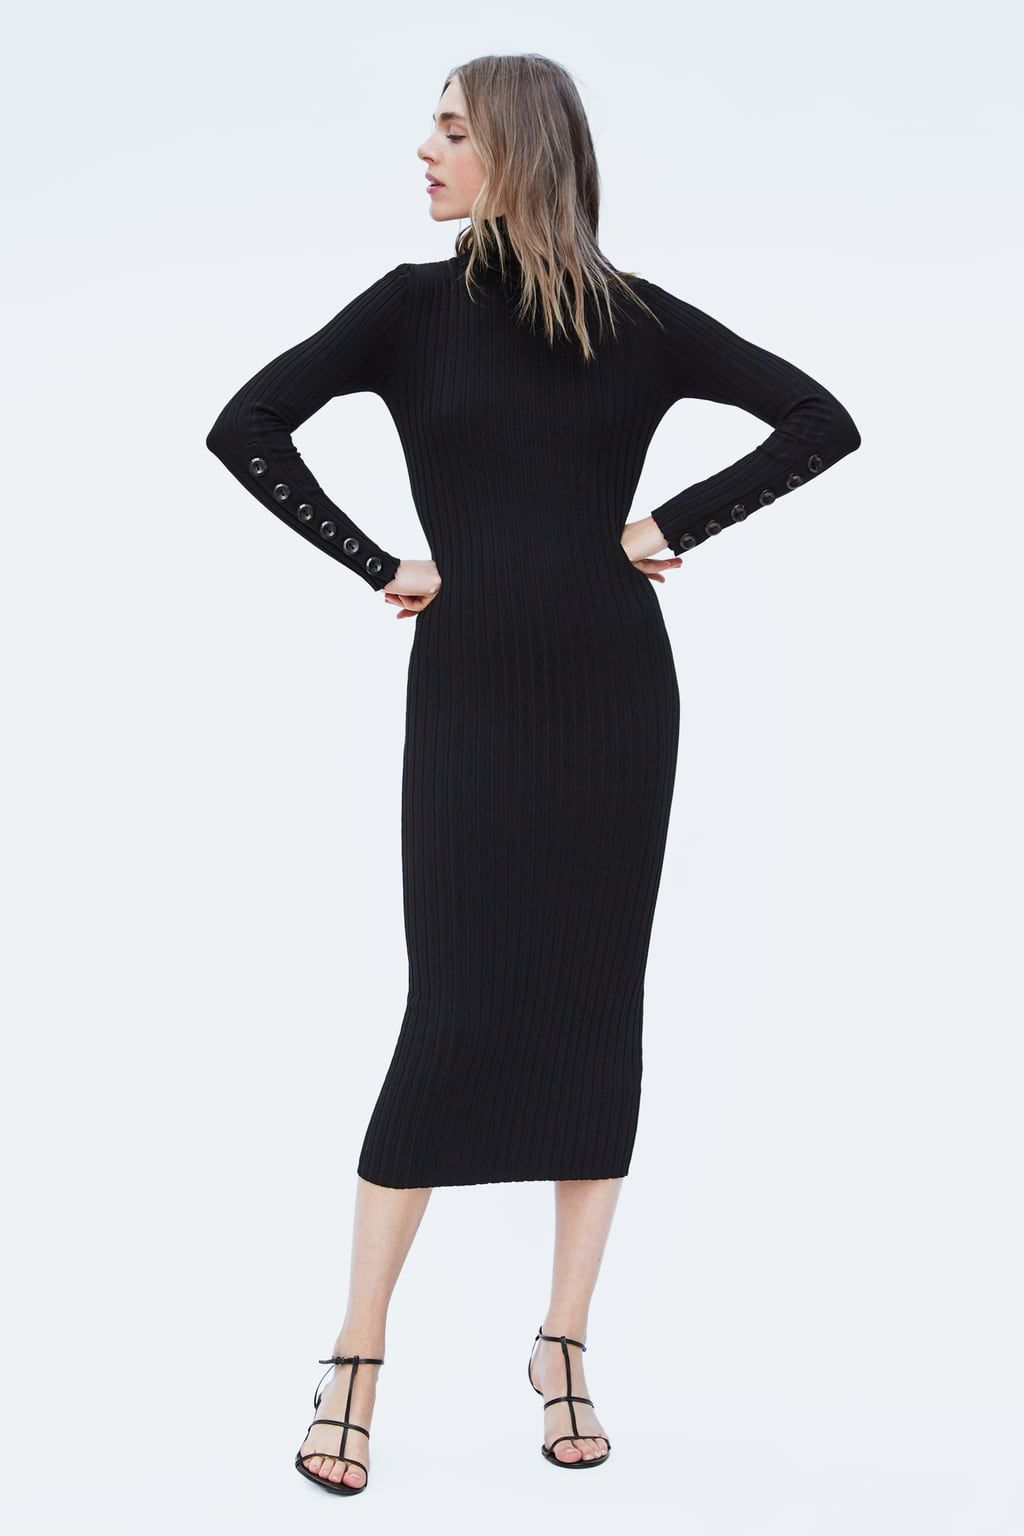 VESTIDO PUNTO BOTONES   ZARA   Dresses, Knit dress und Fashion dresses bbaaa3a552